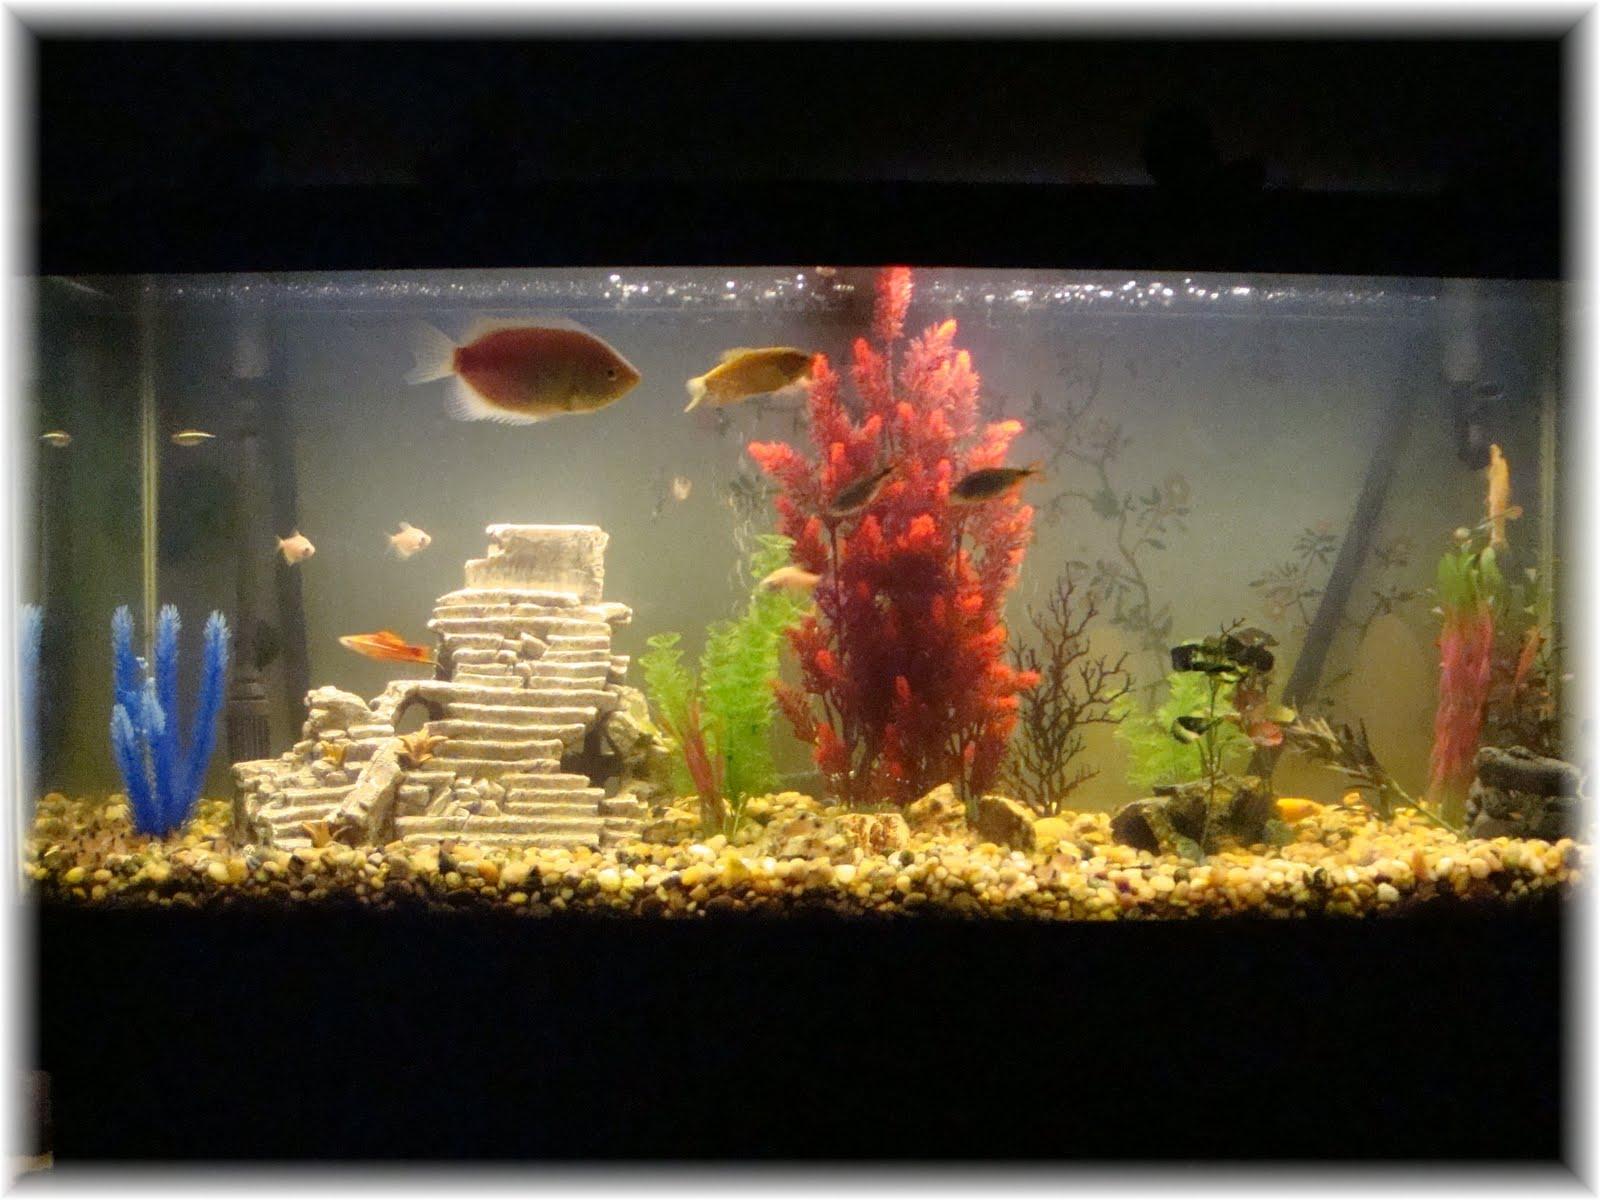 Small fish tank maintenance nj custom design aquarium nj for How to maintain fish tank